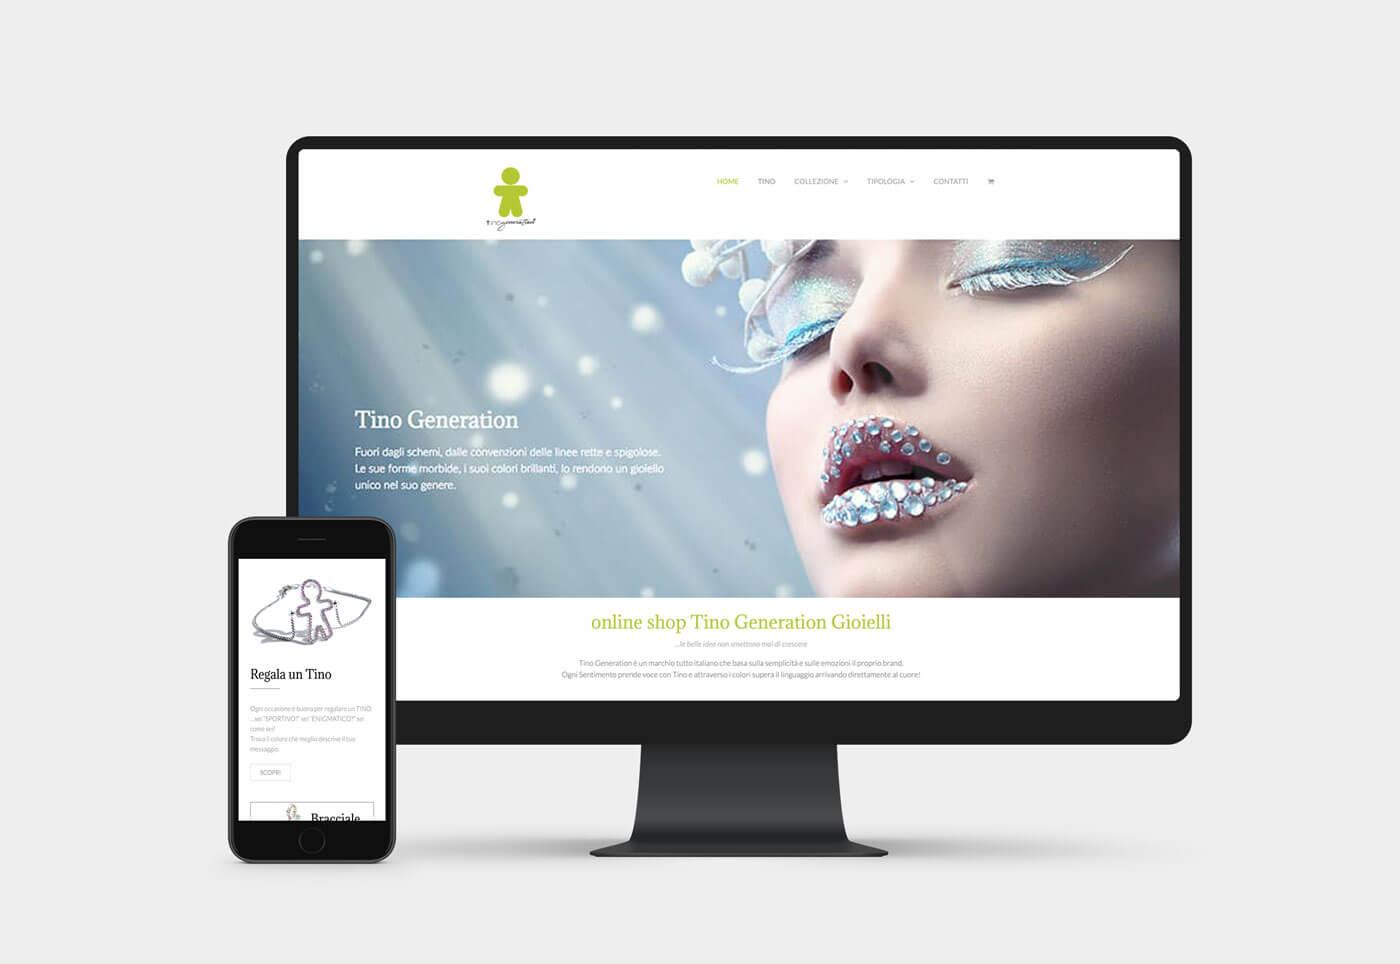 sito ecommerce Tino Generation